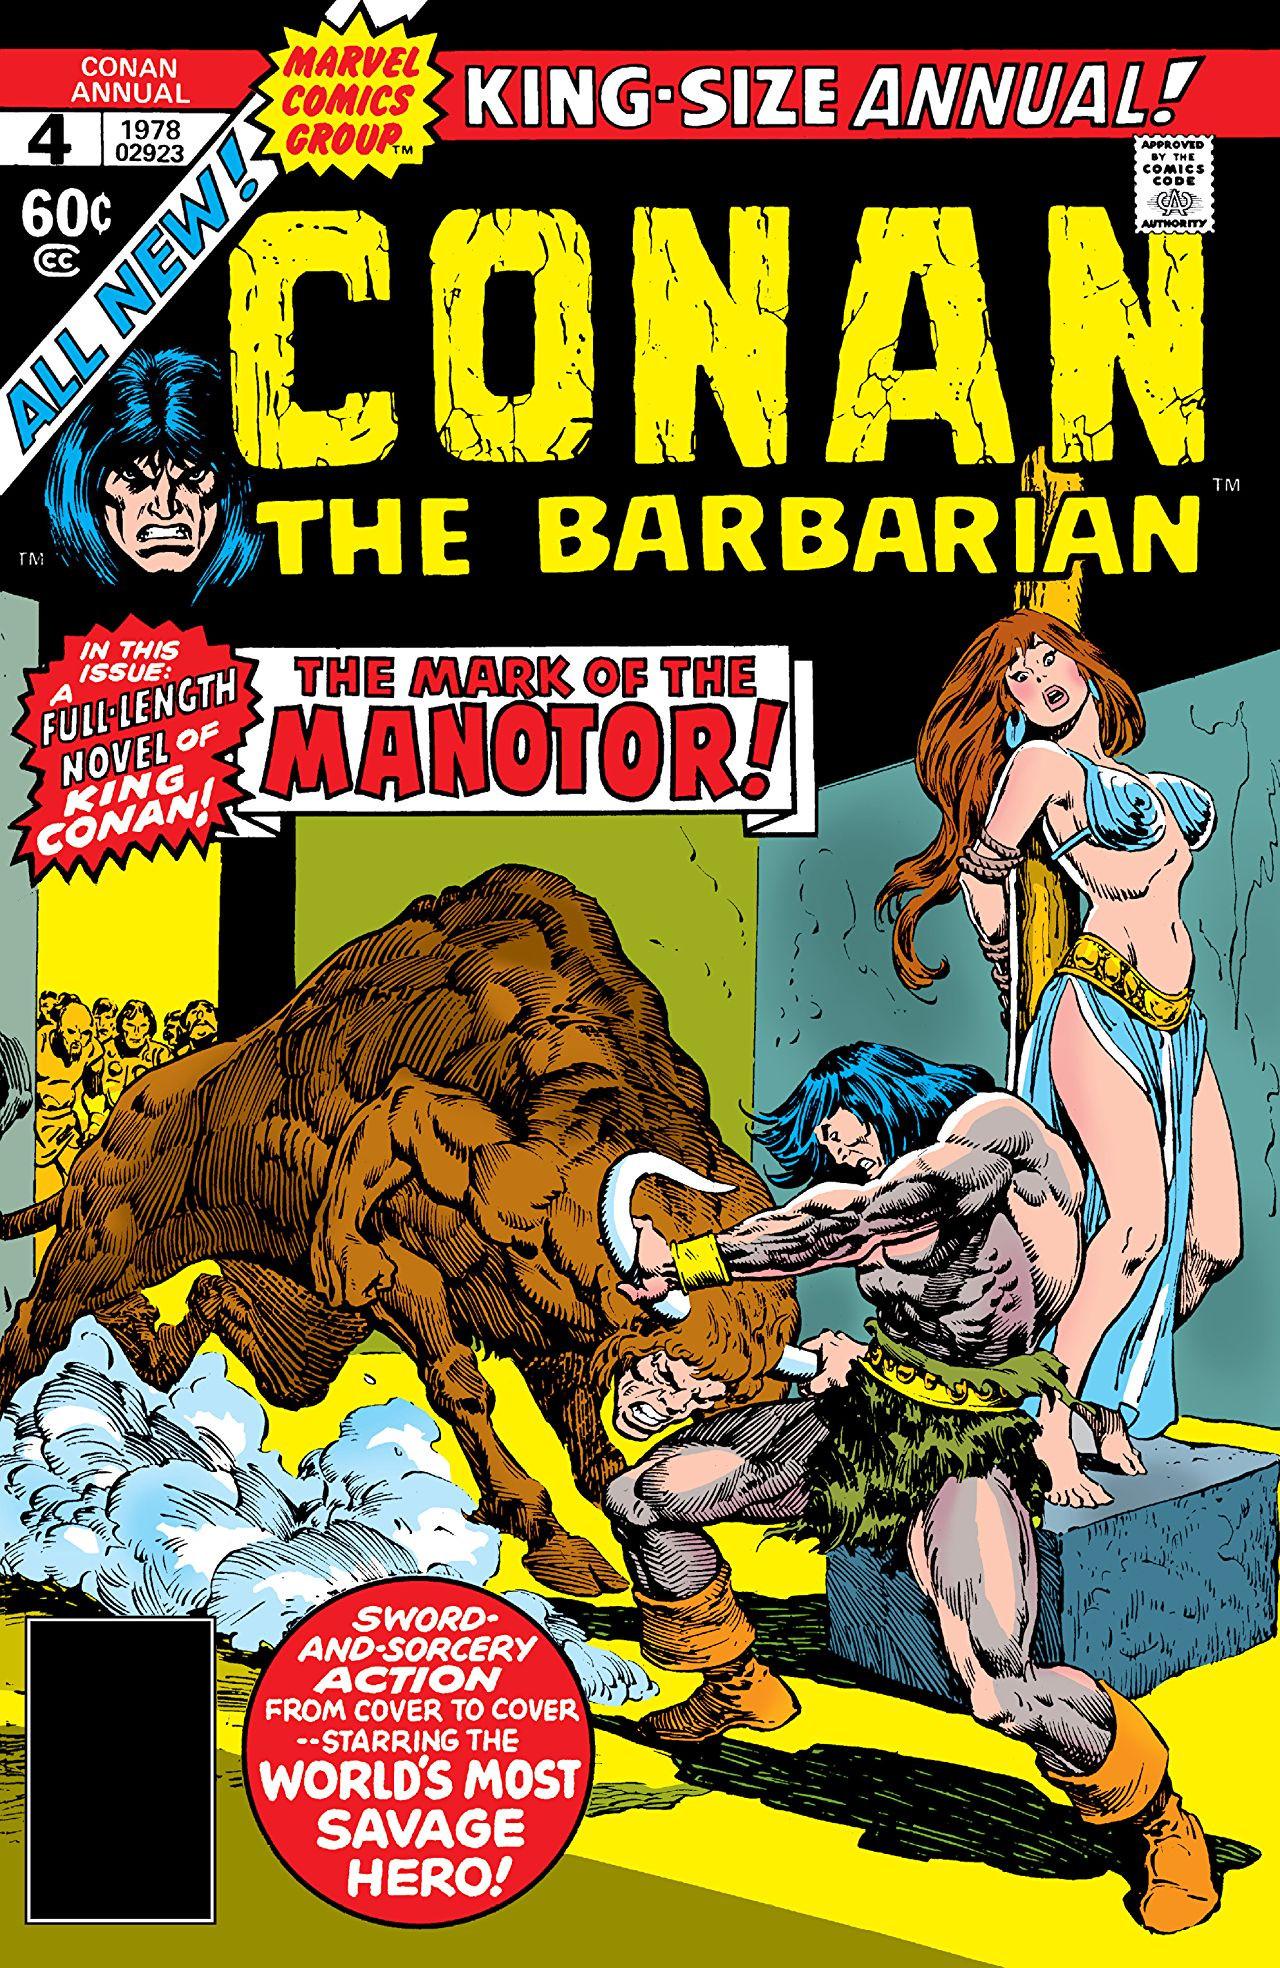 Conan the Barbarian Annual Vol 1 4